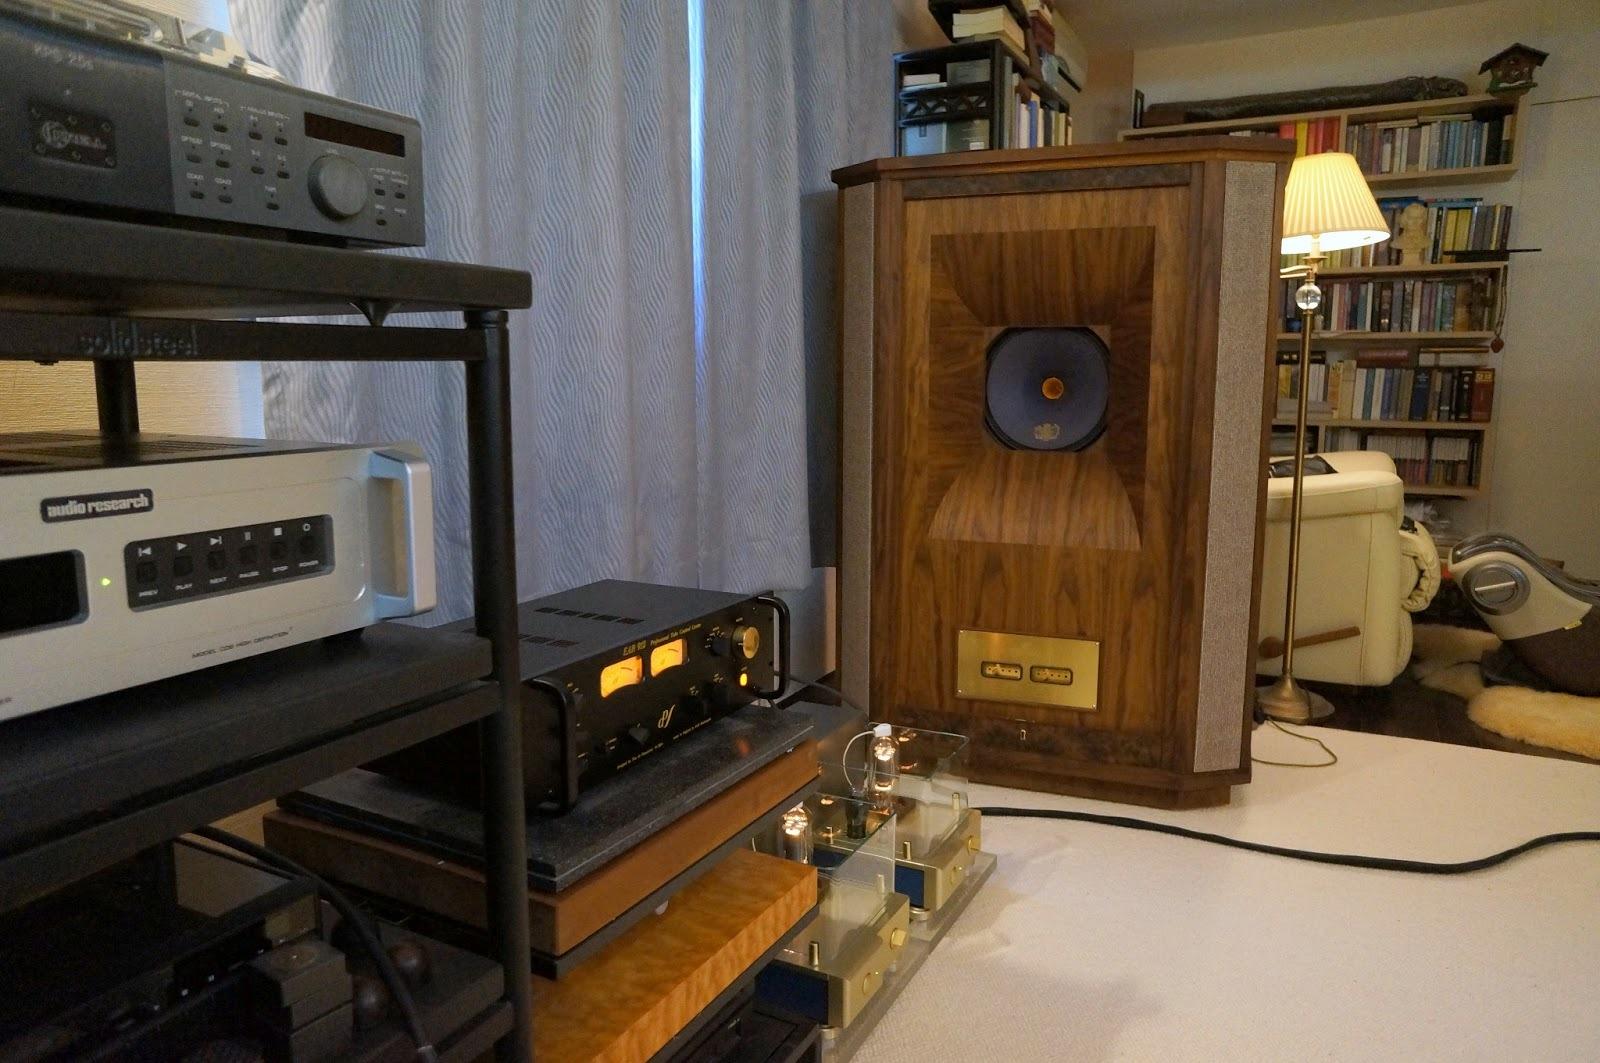 История аудиоаппаратуры класса High-End - 4